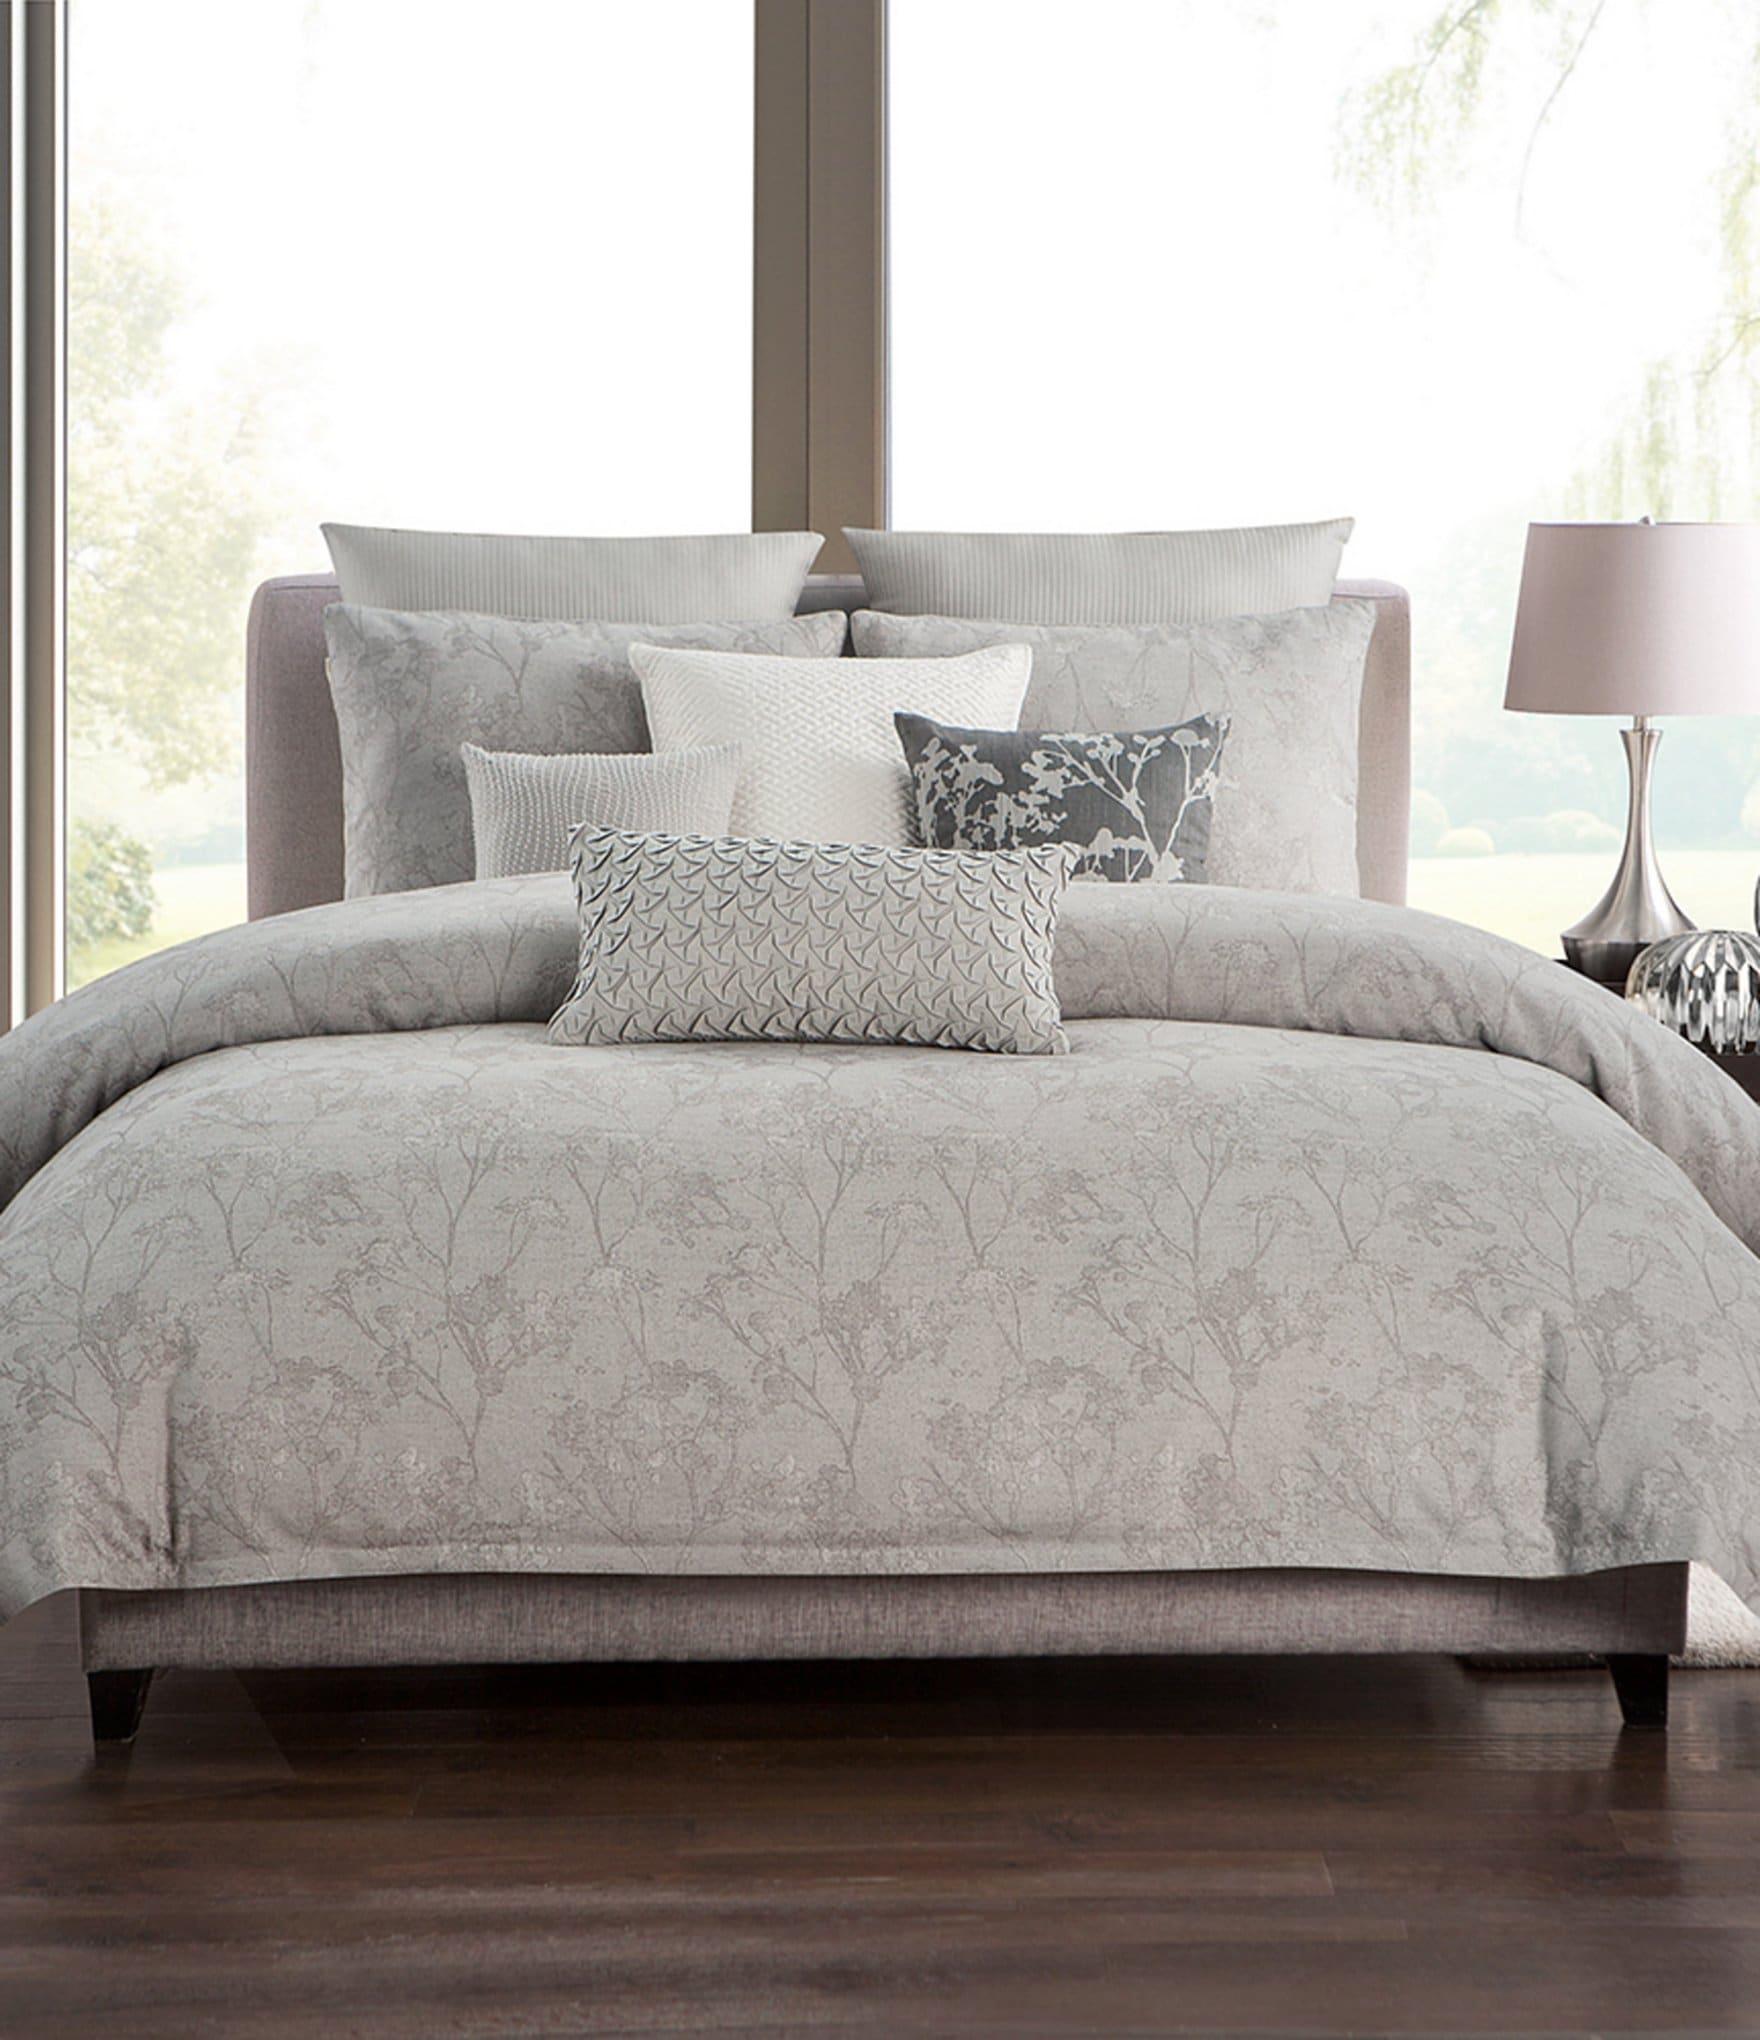 Highline Bedding Co Adelais Floral Comforter Mini Set Dillards